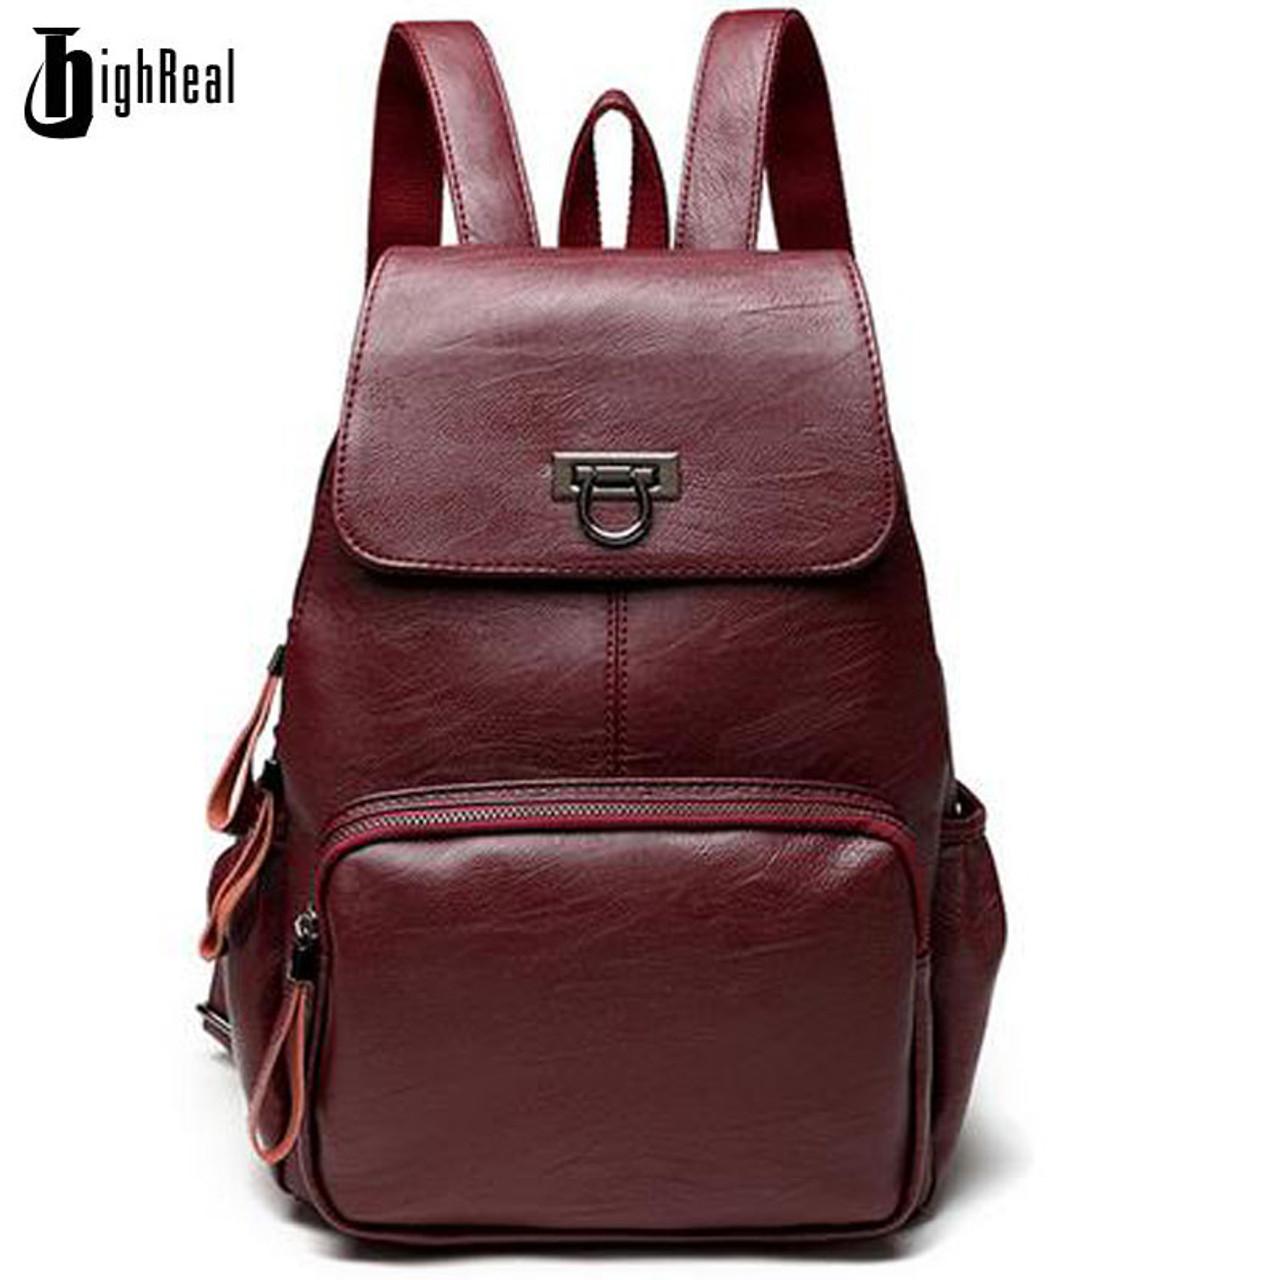 Designer Women s Backpacks Genuine Leather Female Backpack Women School Bag  For Girls Large Capacity Shoulder Travel Mochila - OnshopDeals.Com 39893696fd